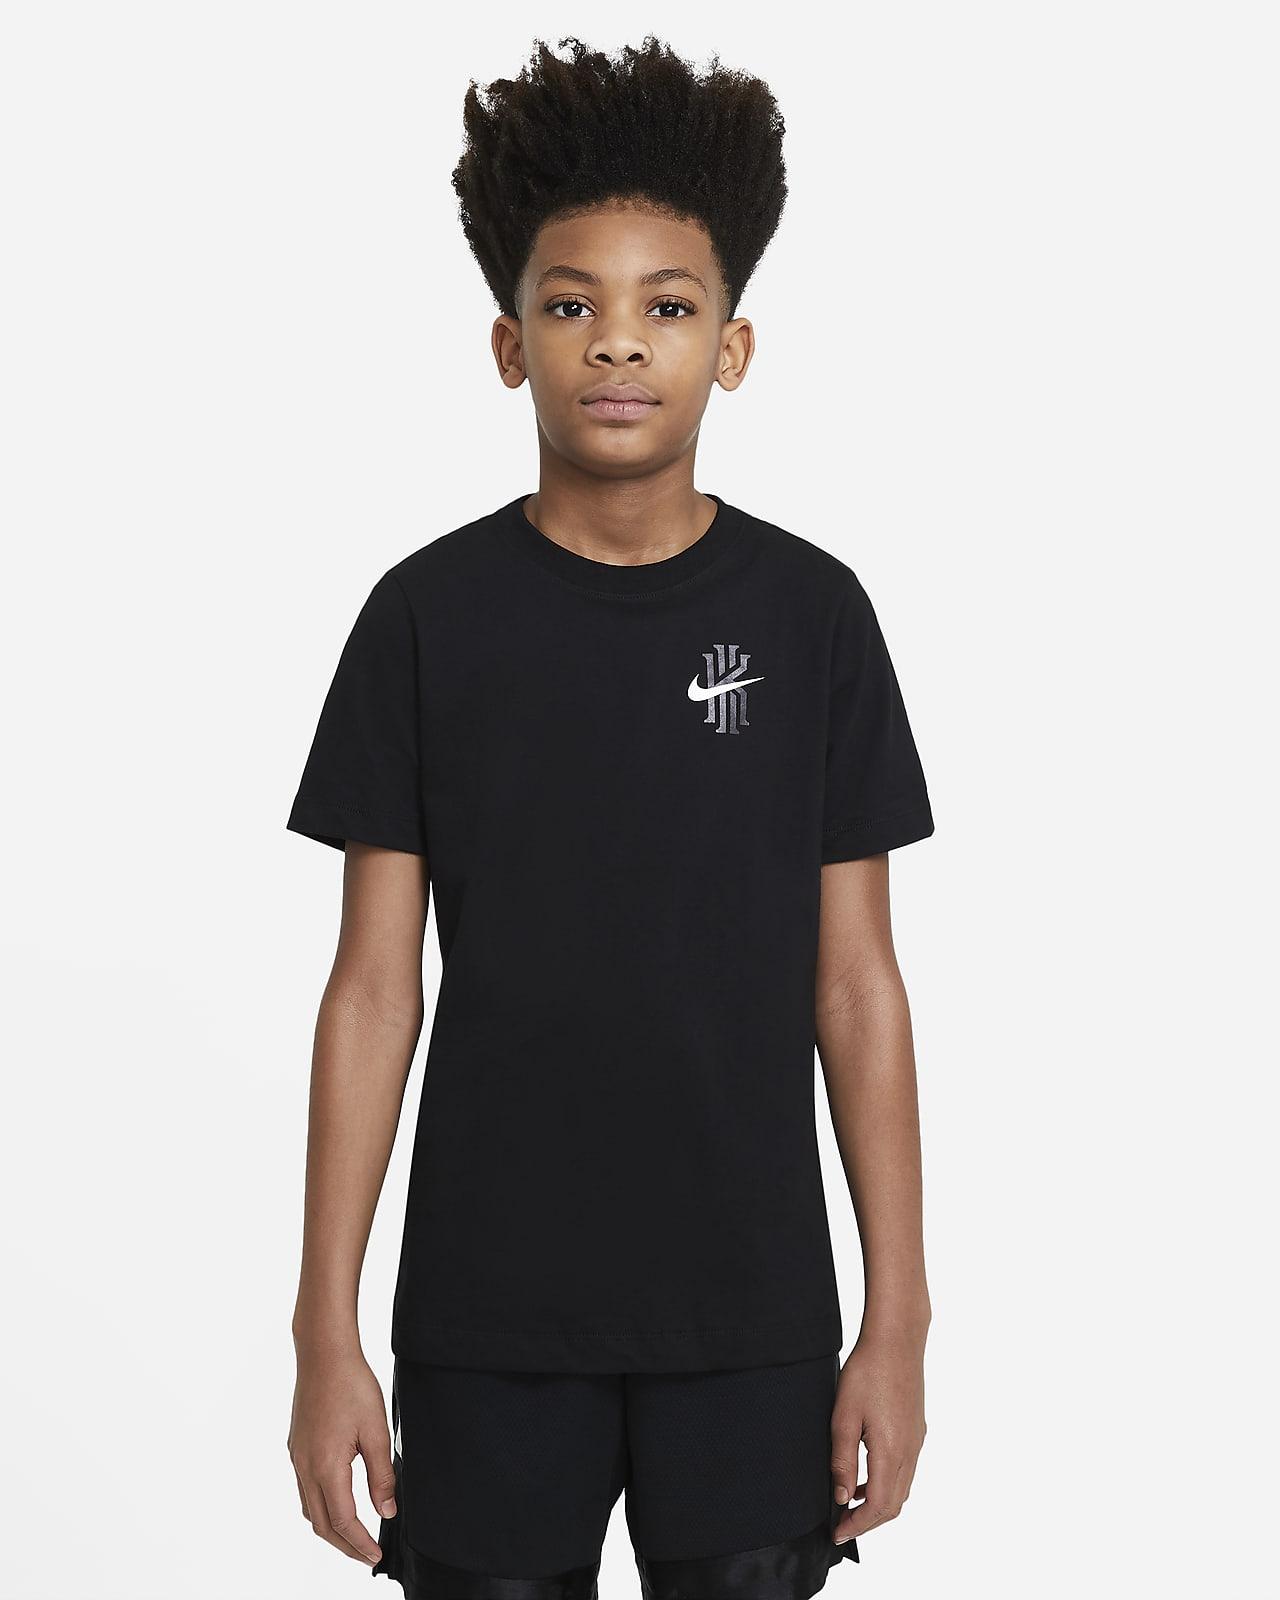 Kyrie Big Kids' (Boys') T-Shirt